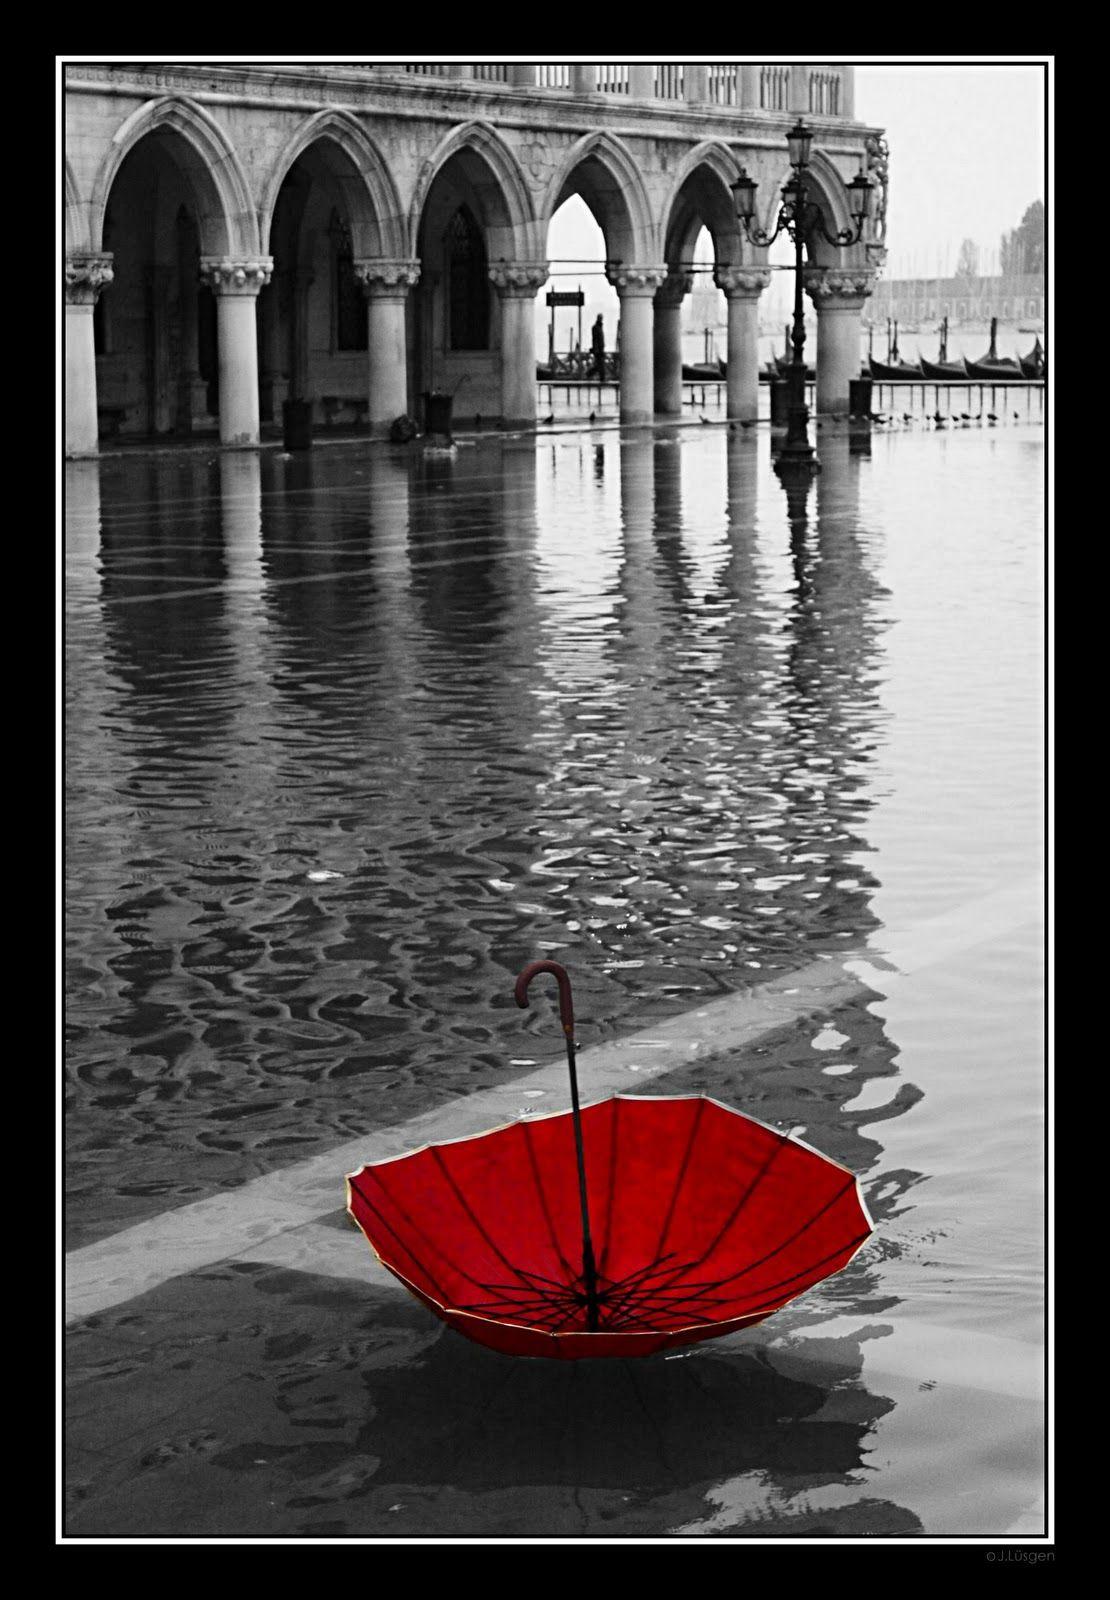 Red umbrella in venice